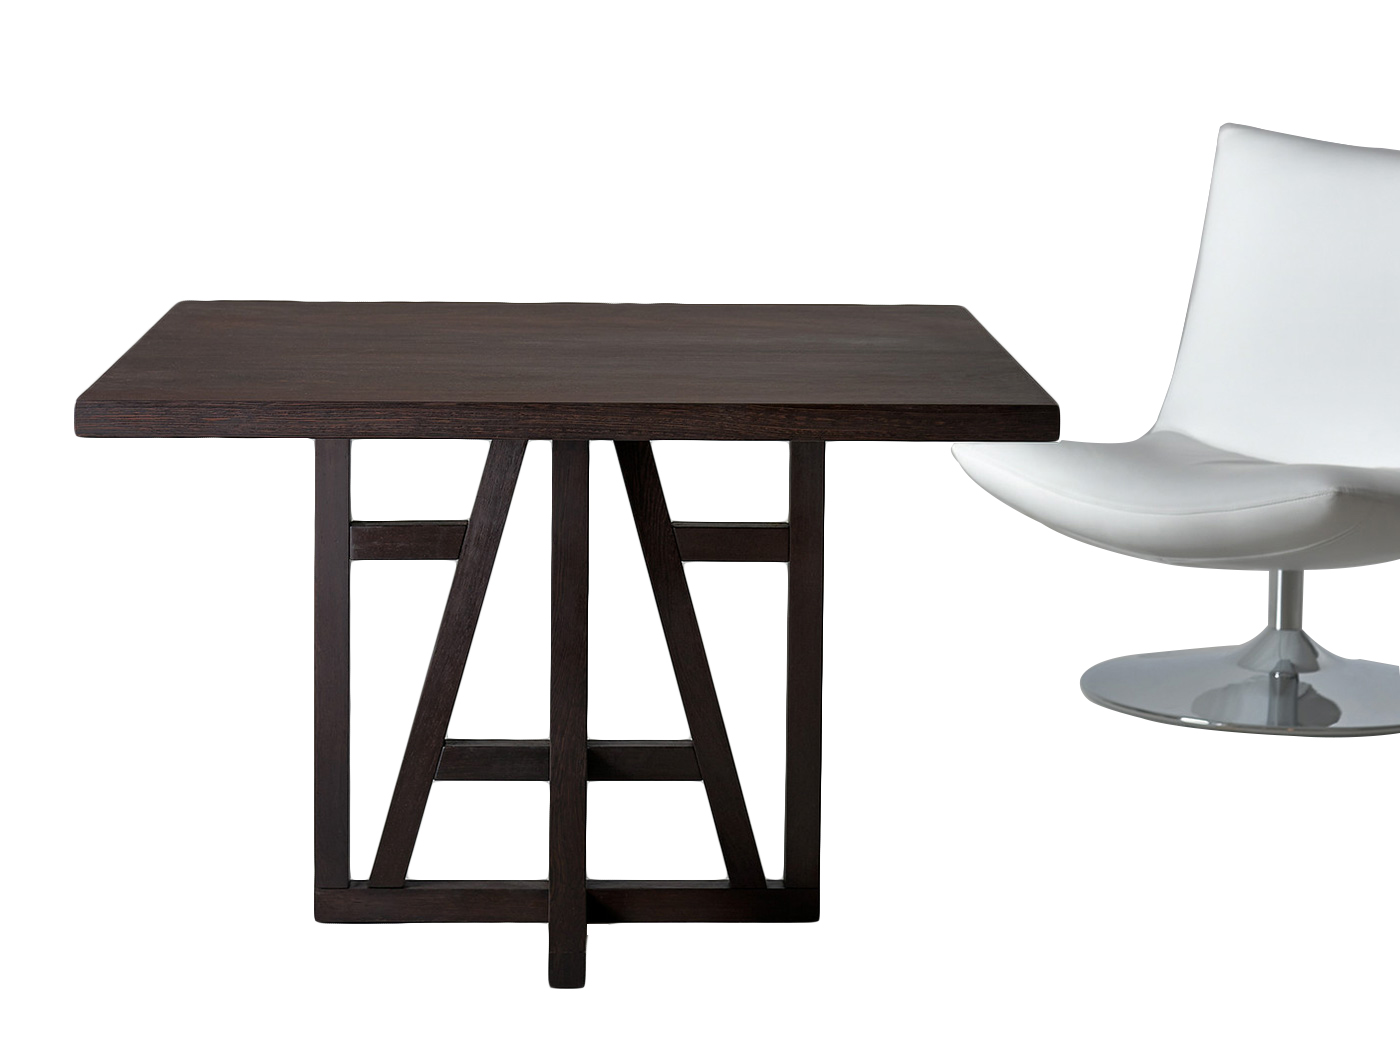 Design Vierkante Eettafel.Salzburg Vierkante Houten Eettafel